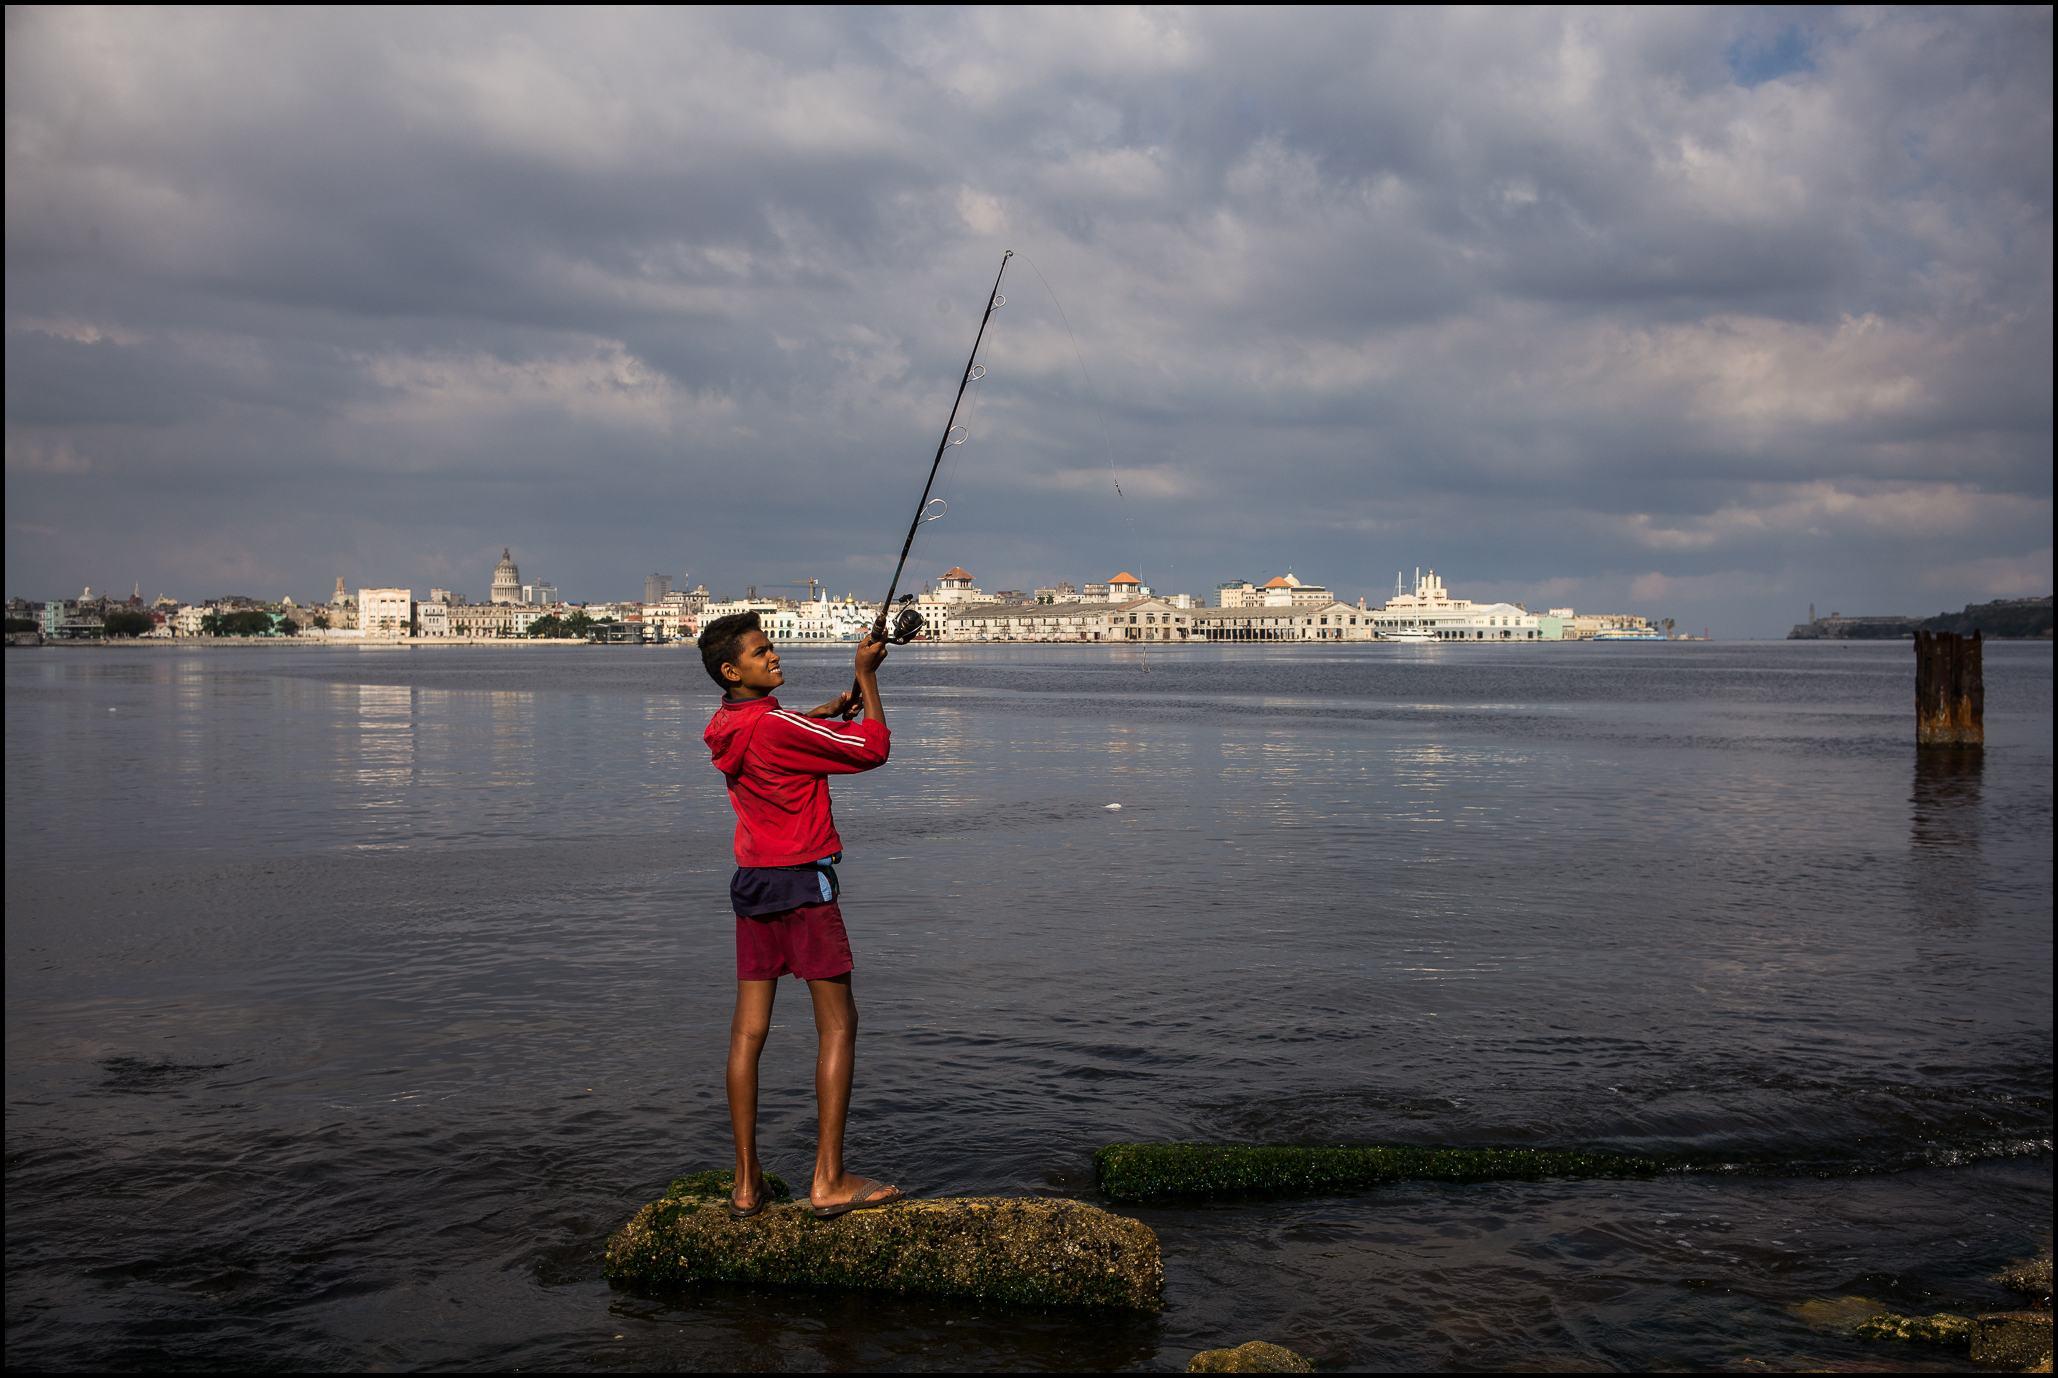 Boy Fishing, Regla